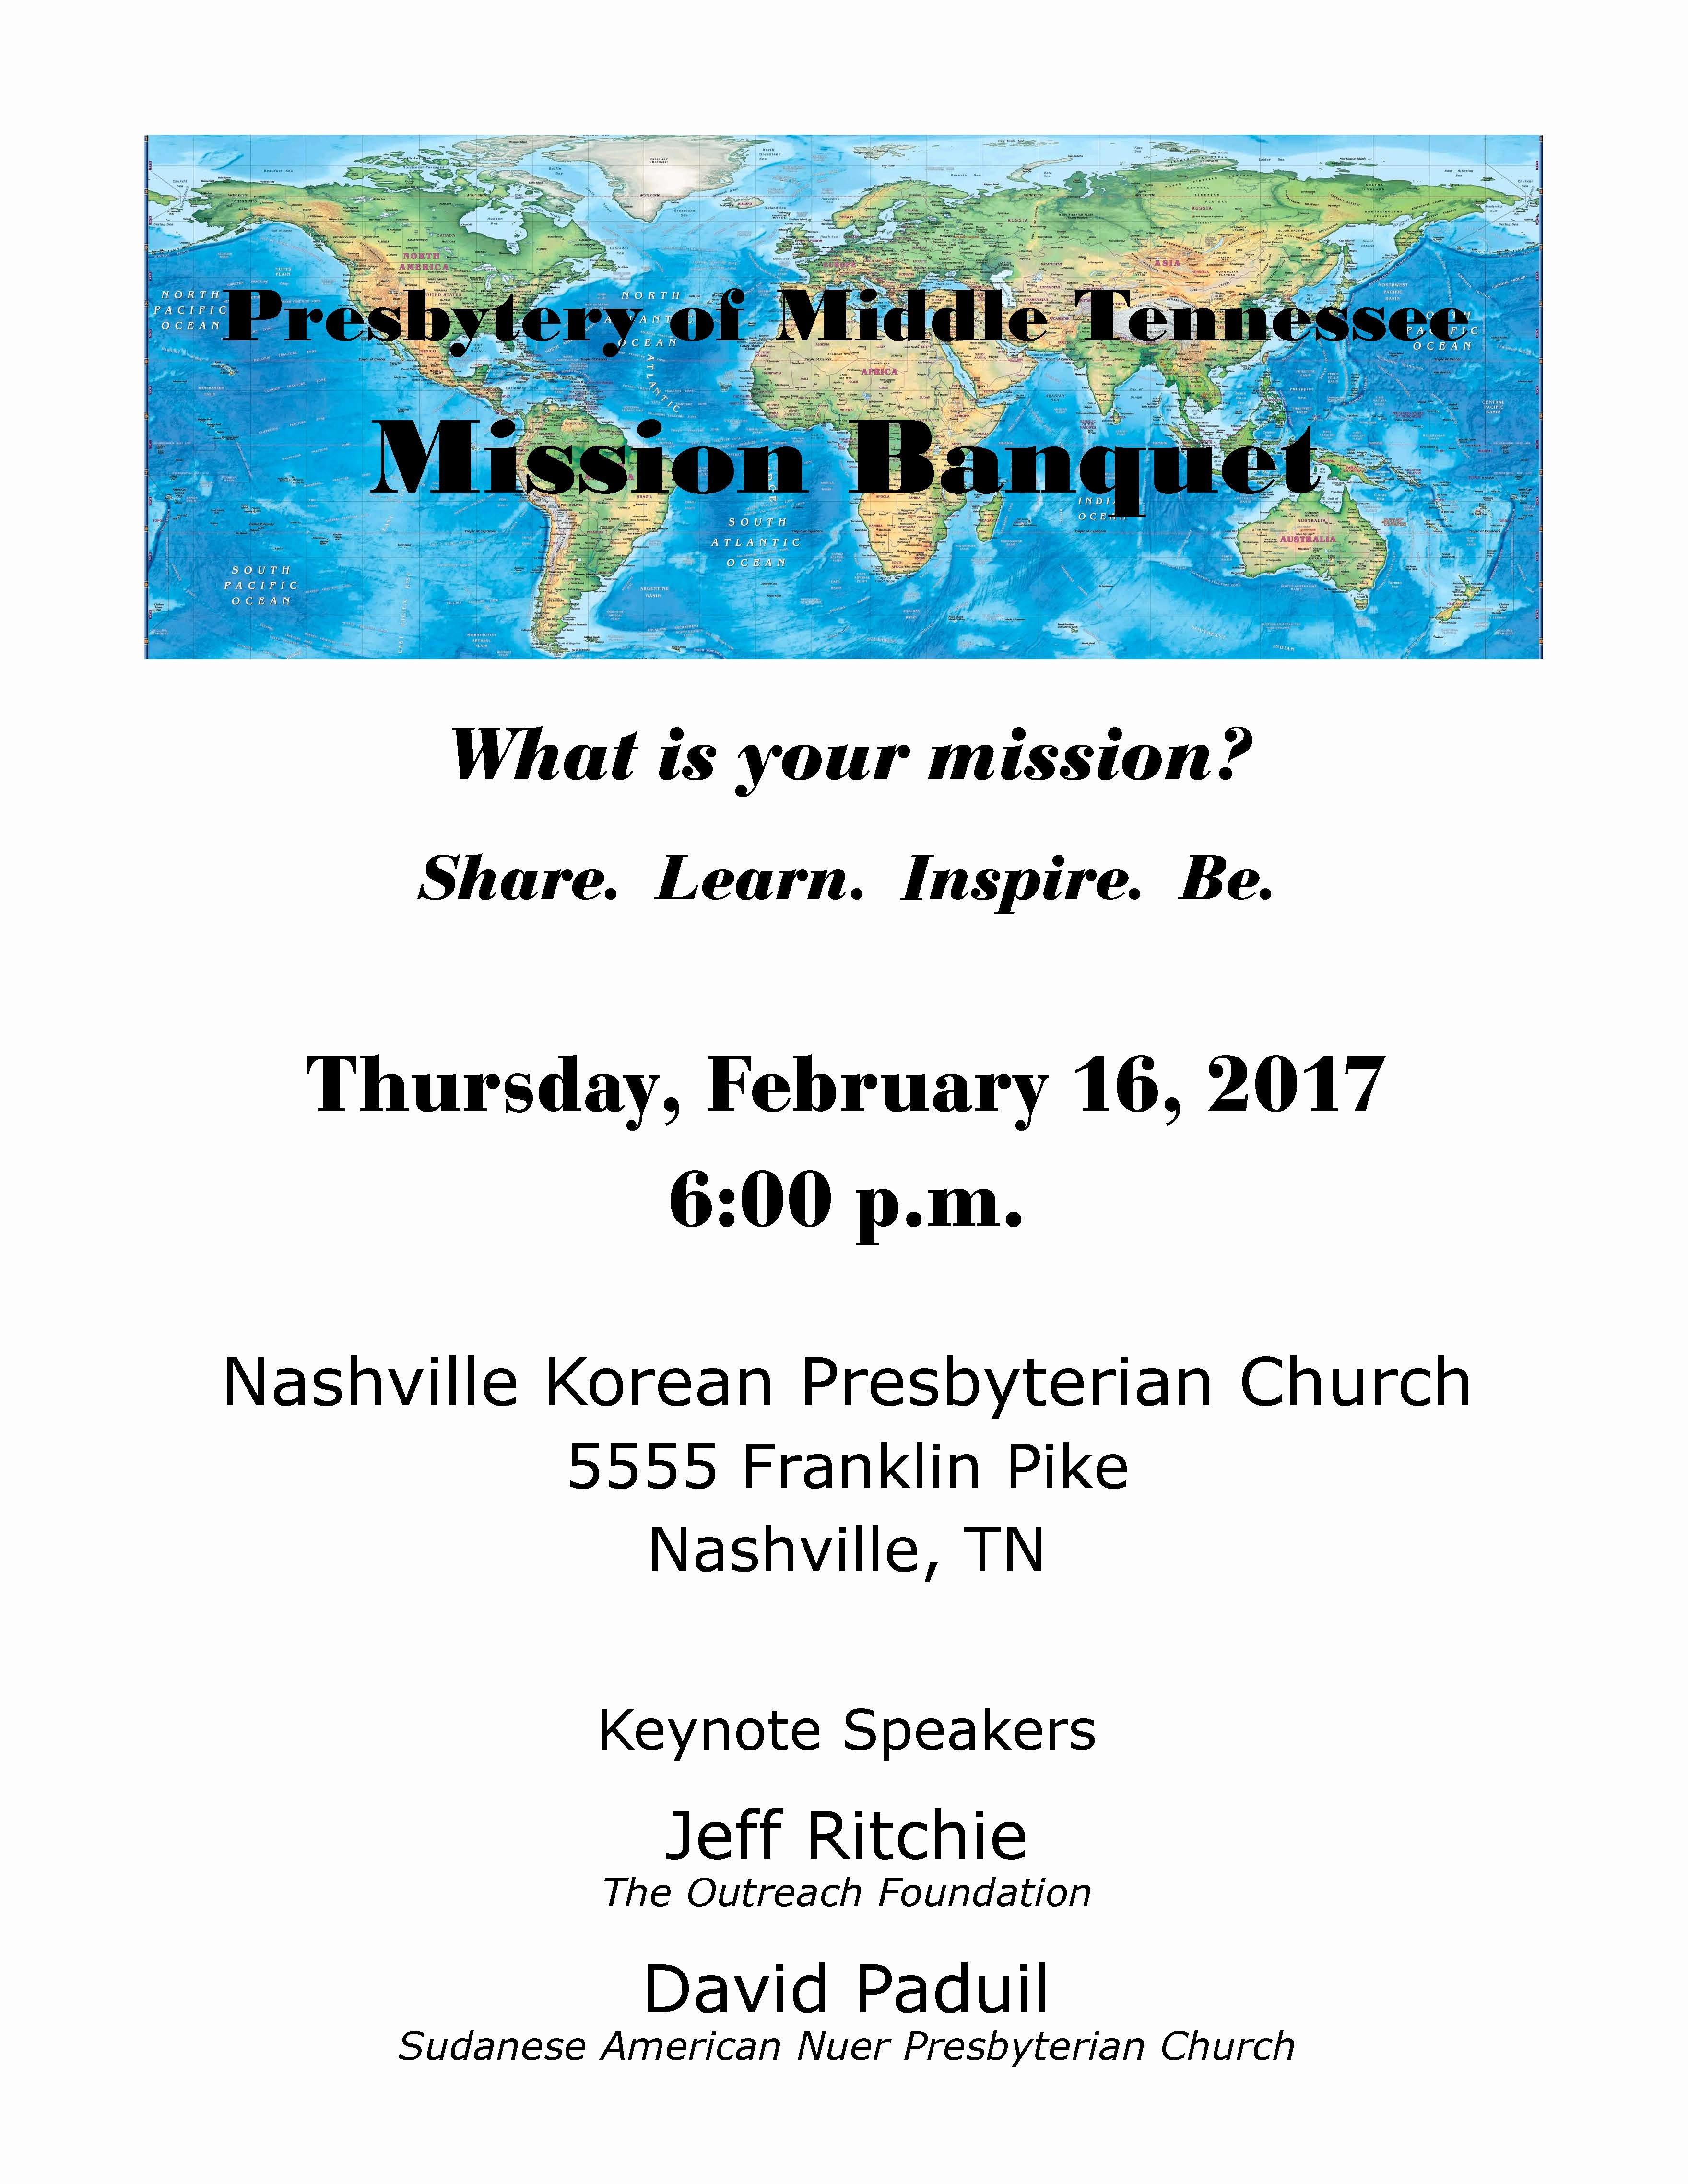 Church Banquet Program Fresh Mission Banquet – February 16 2017